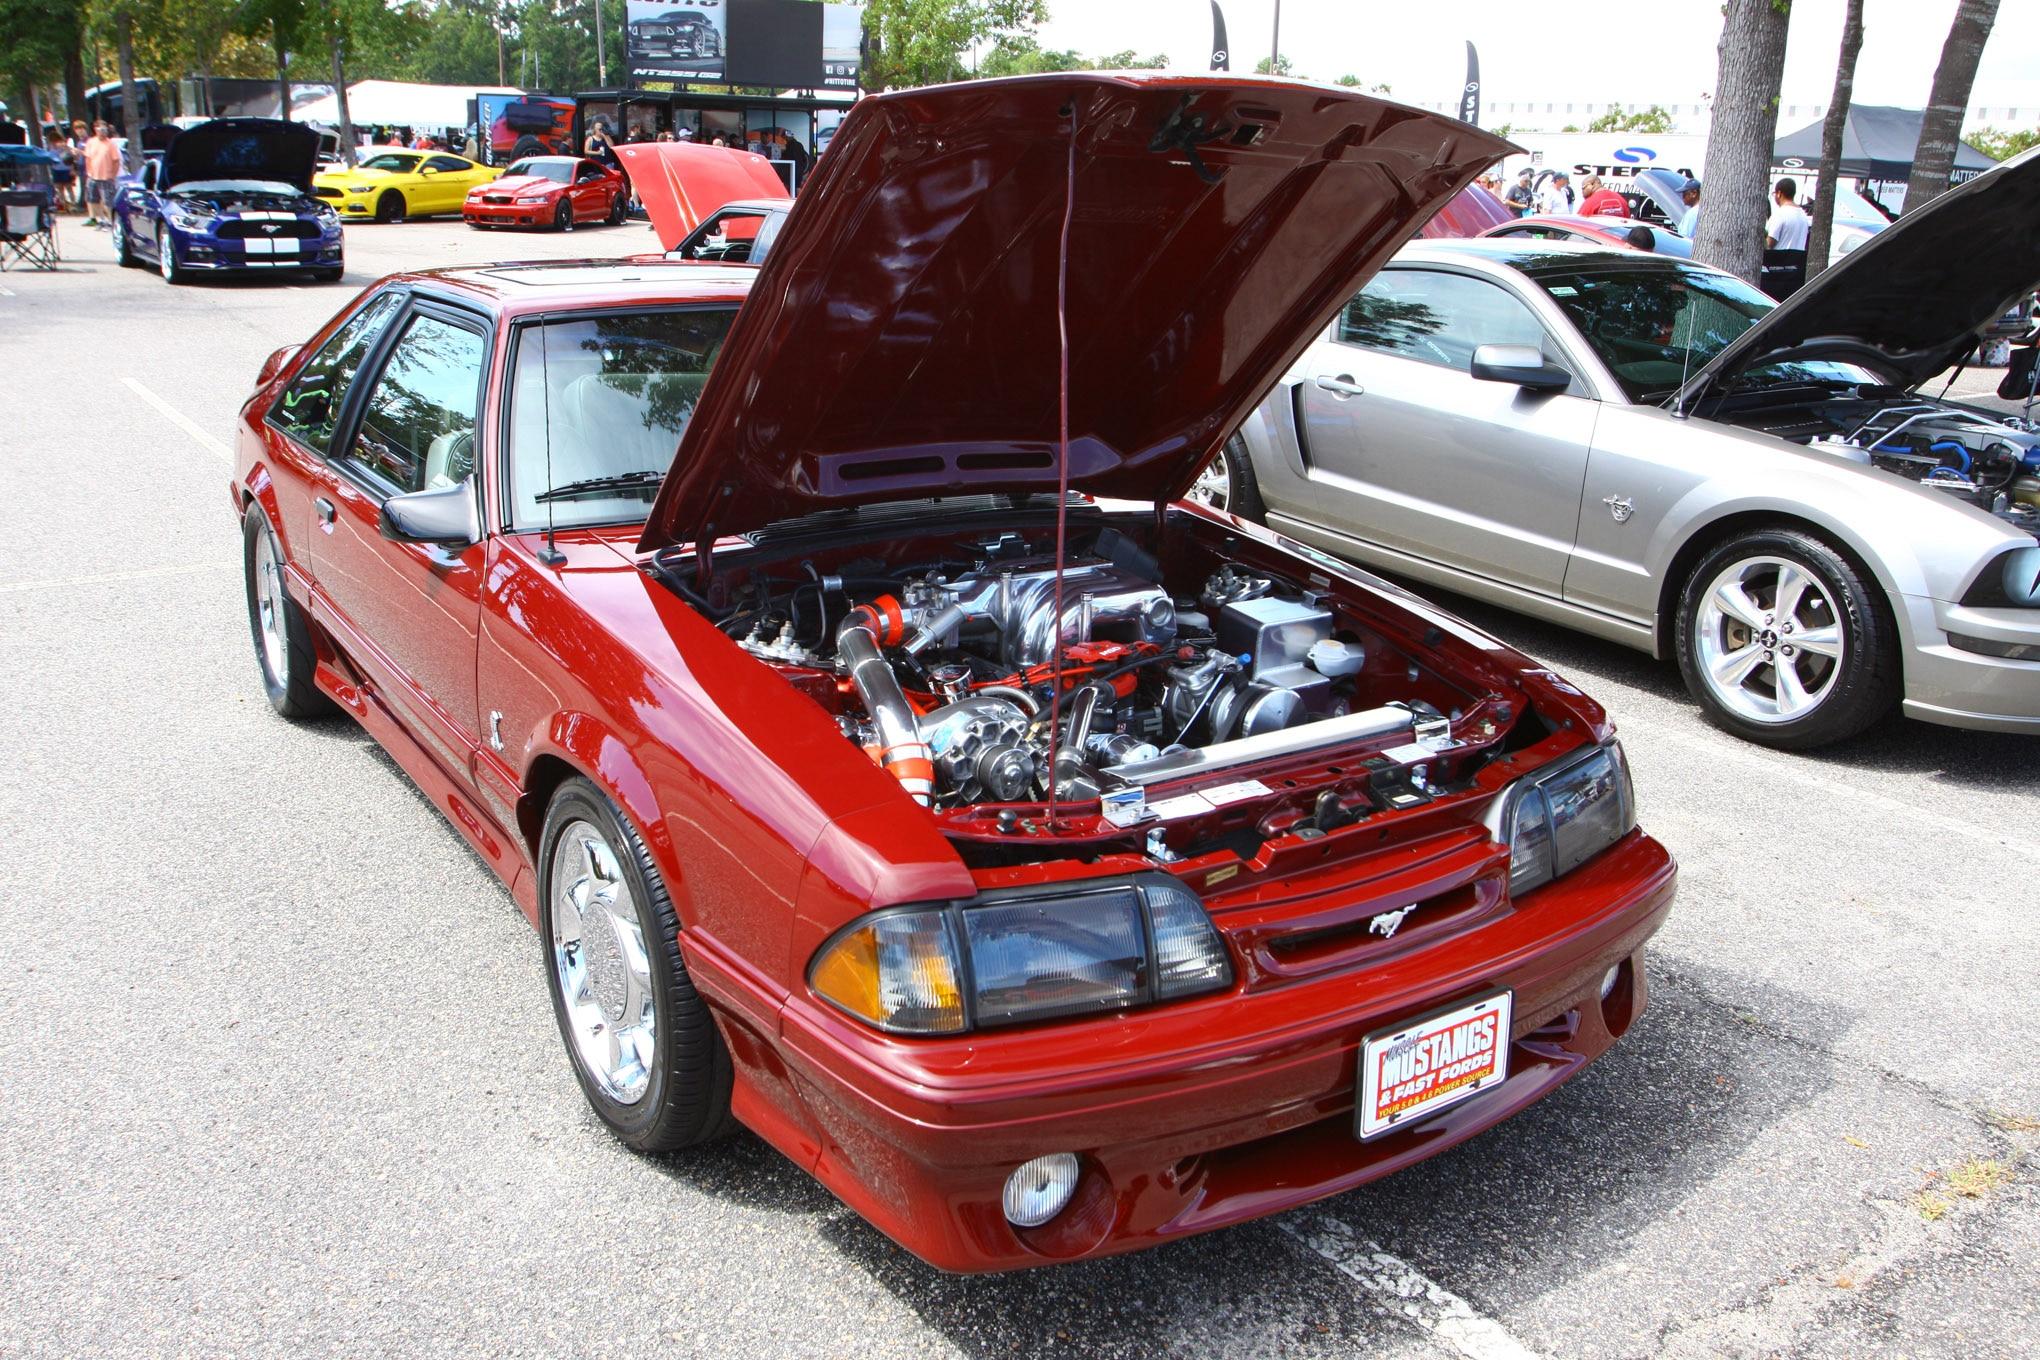 Friday CJ Pony Parts Mustang Week Car Show 44